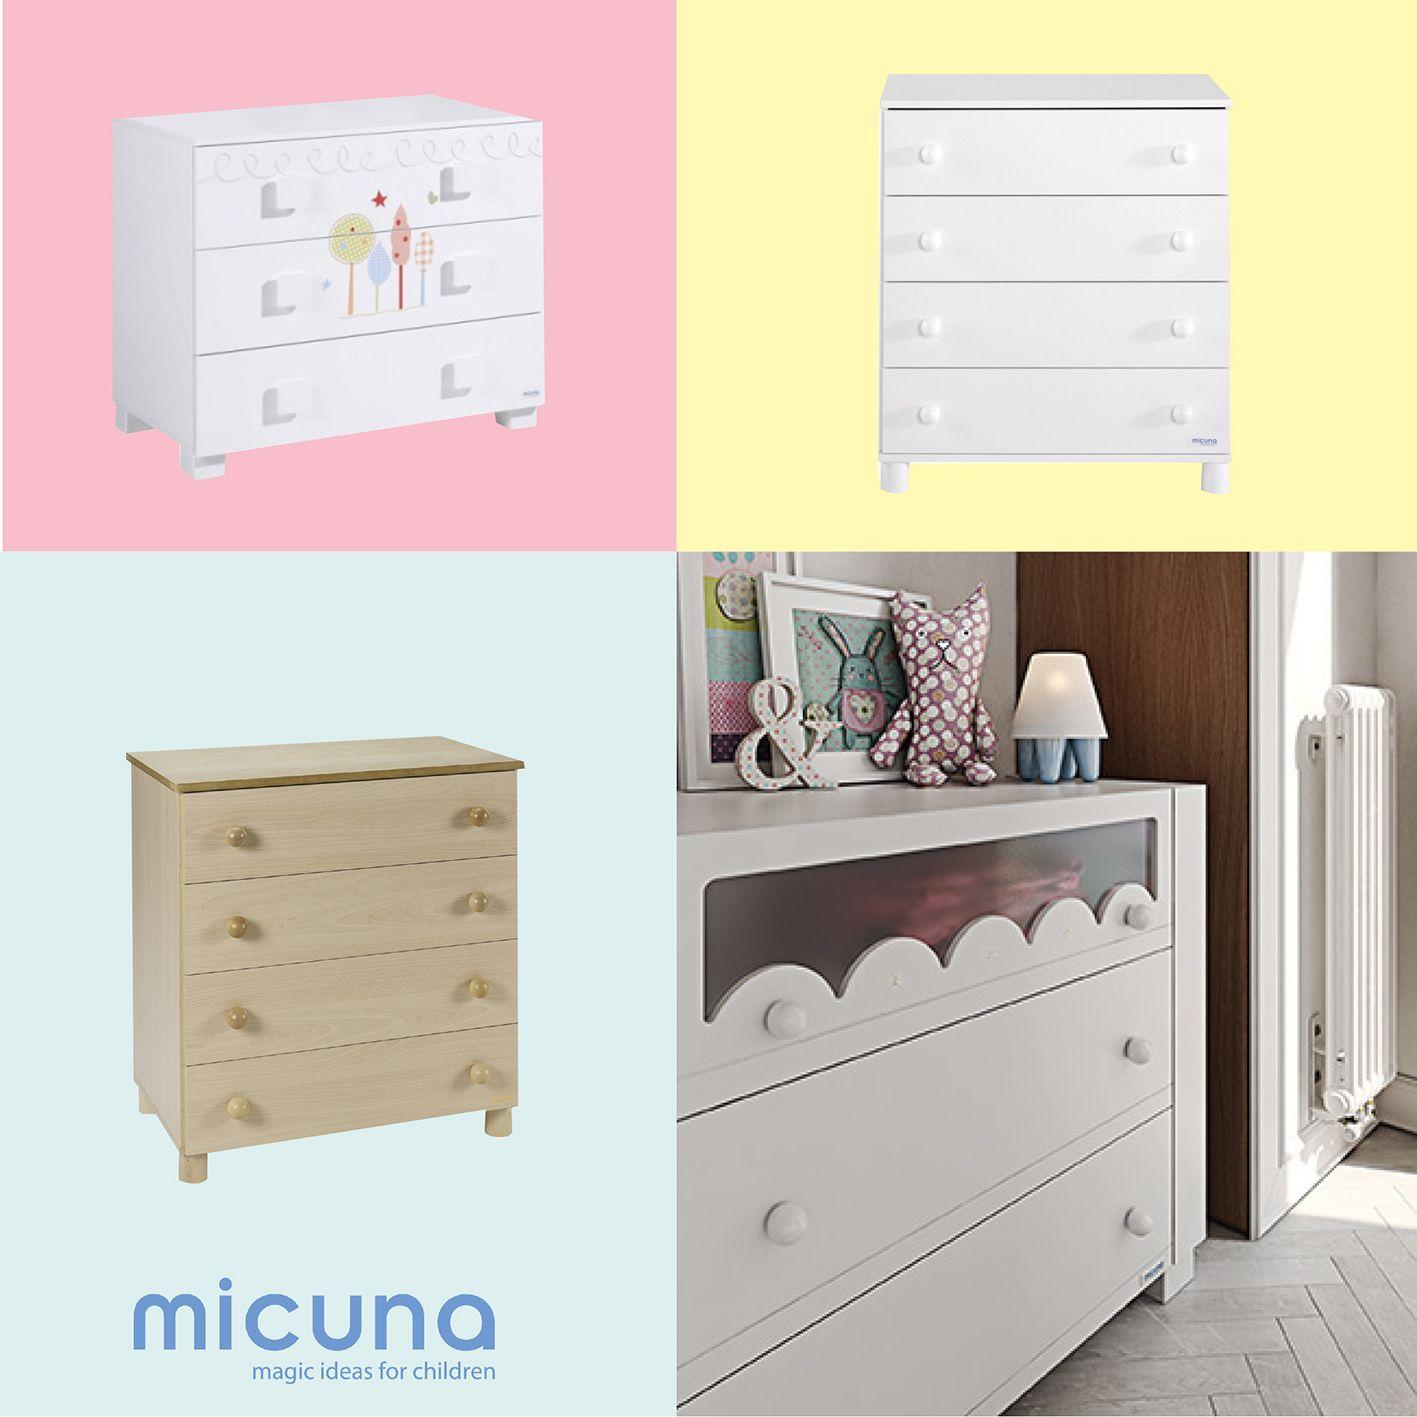 C modas para beb s muebles para beb s micuna mimix - Muebles para bebes ...